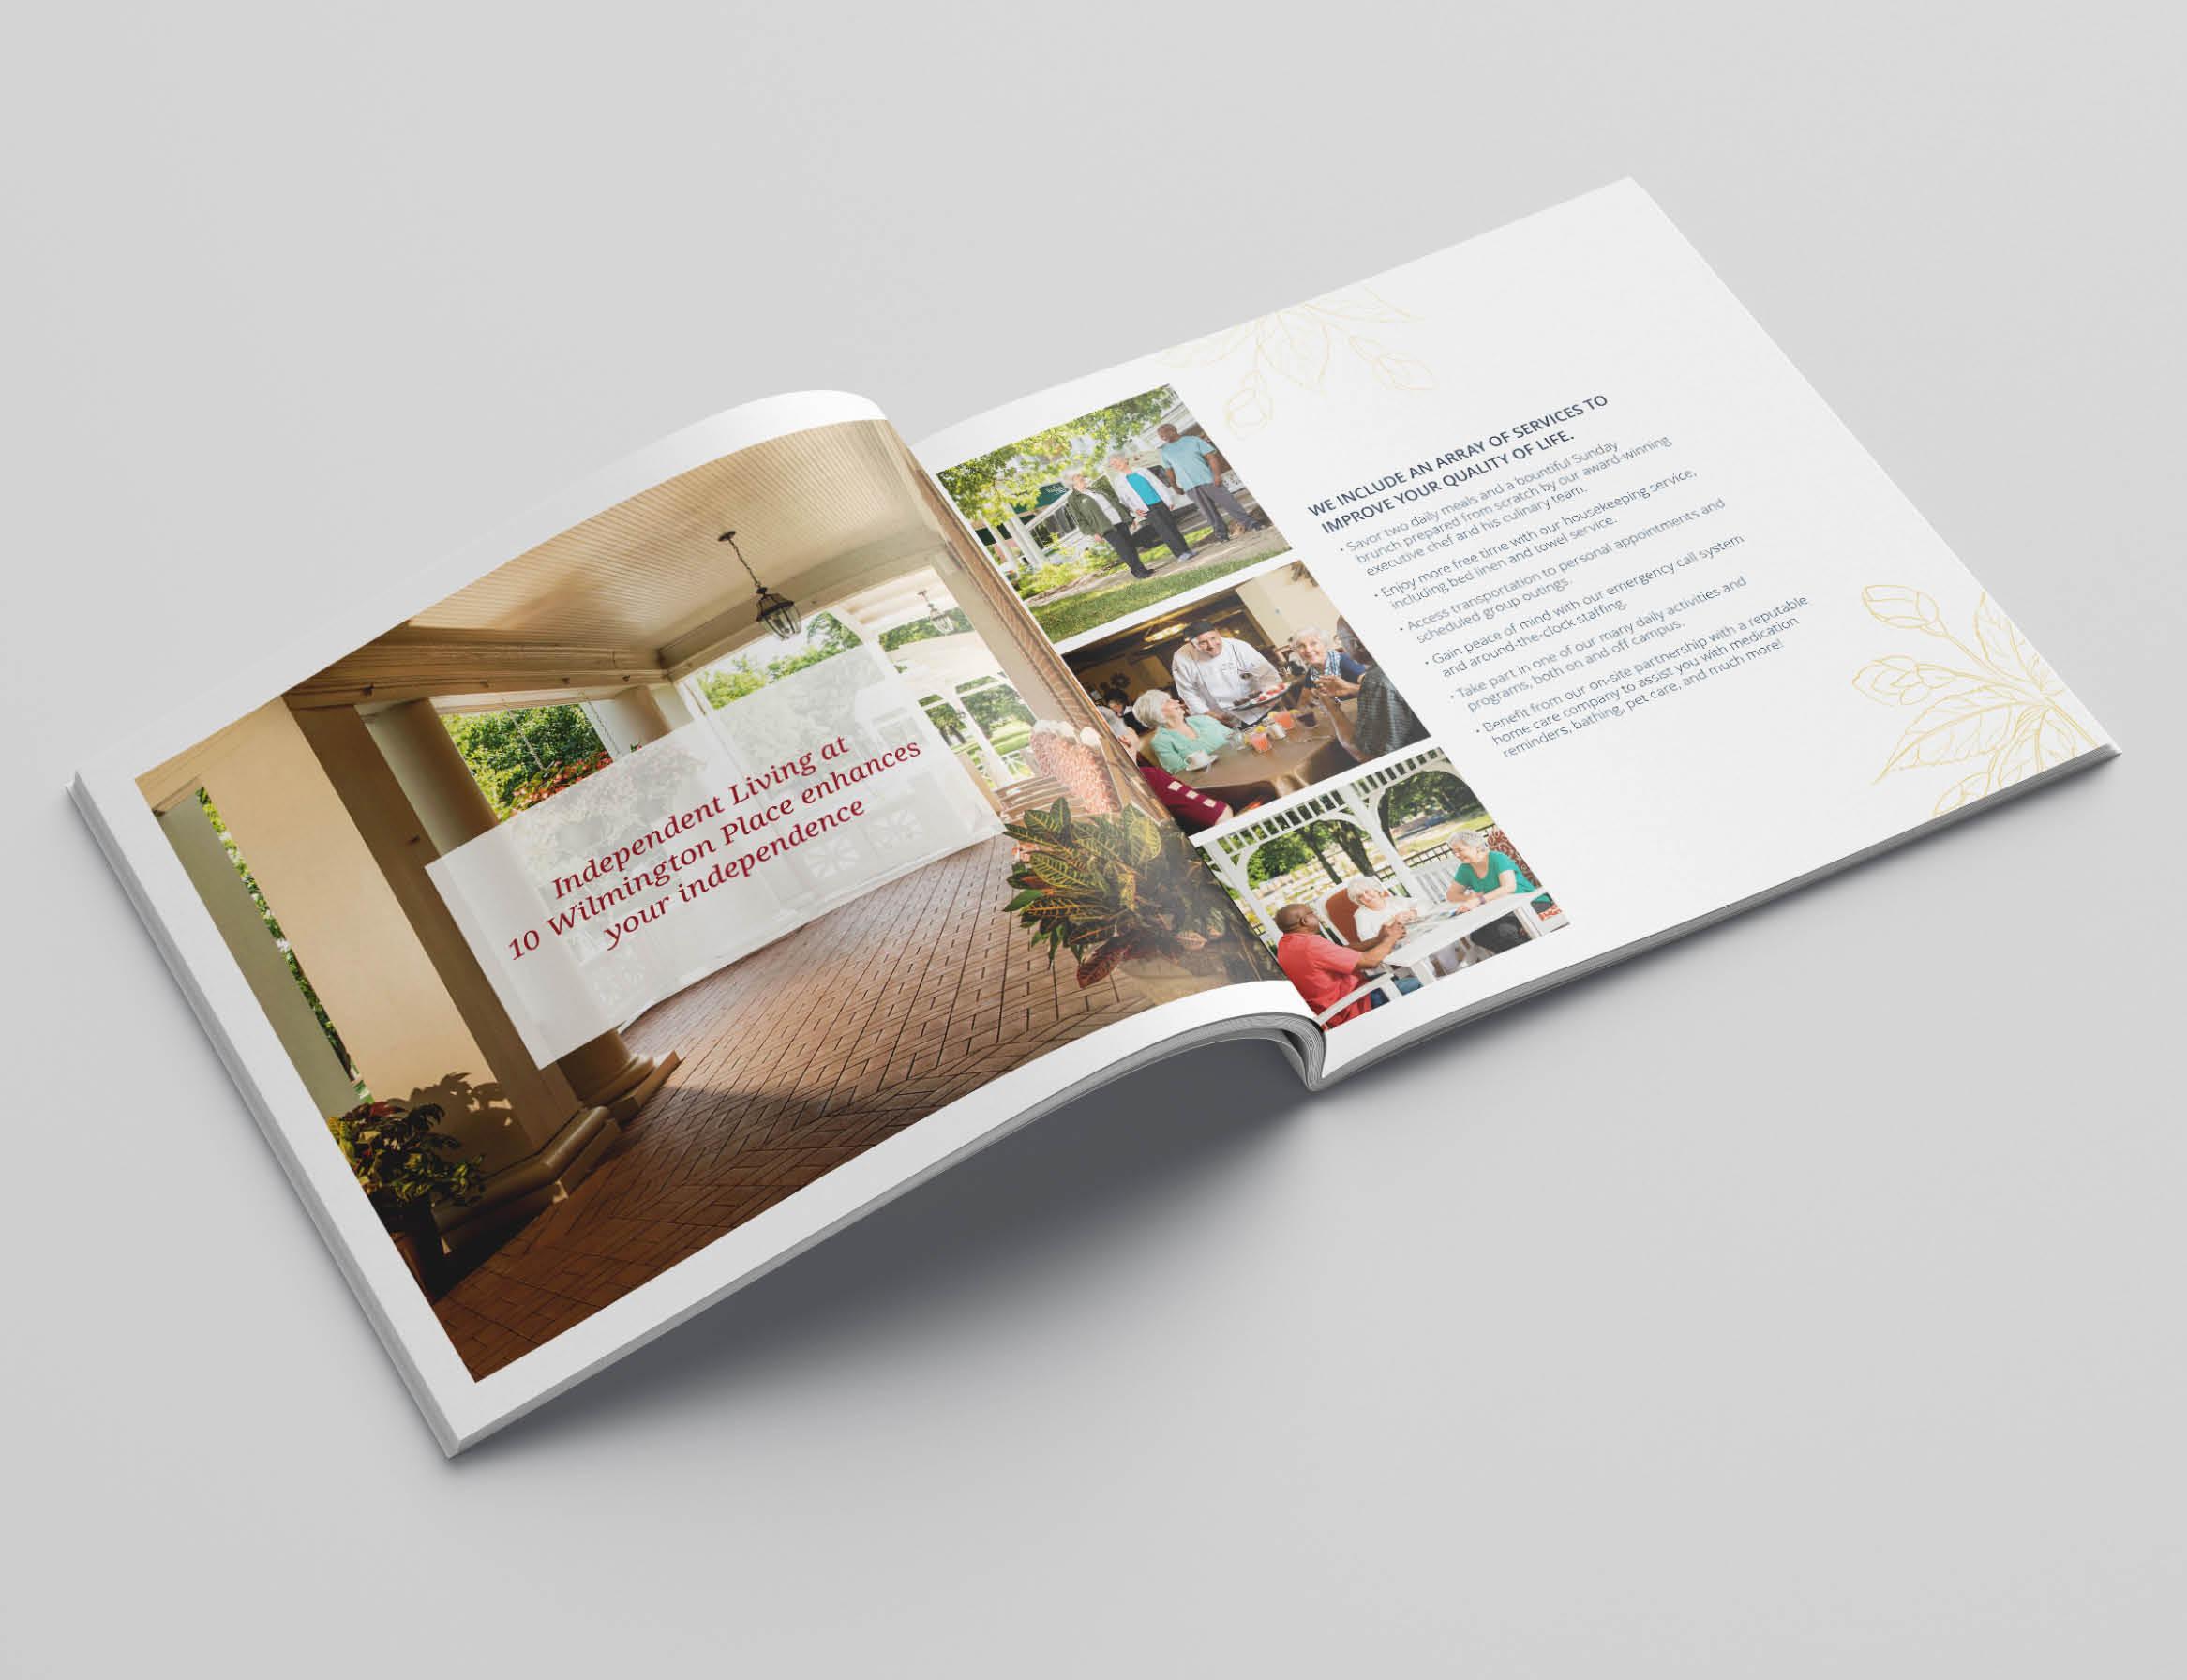 LMG Portfolio_10 Wilmington Place_Brochures_2